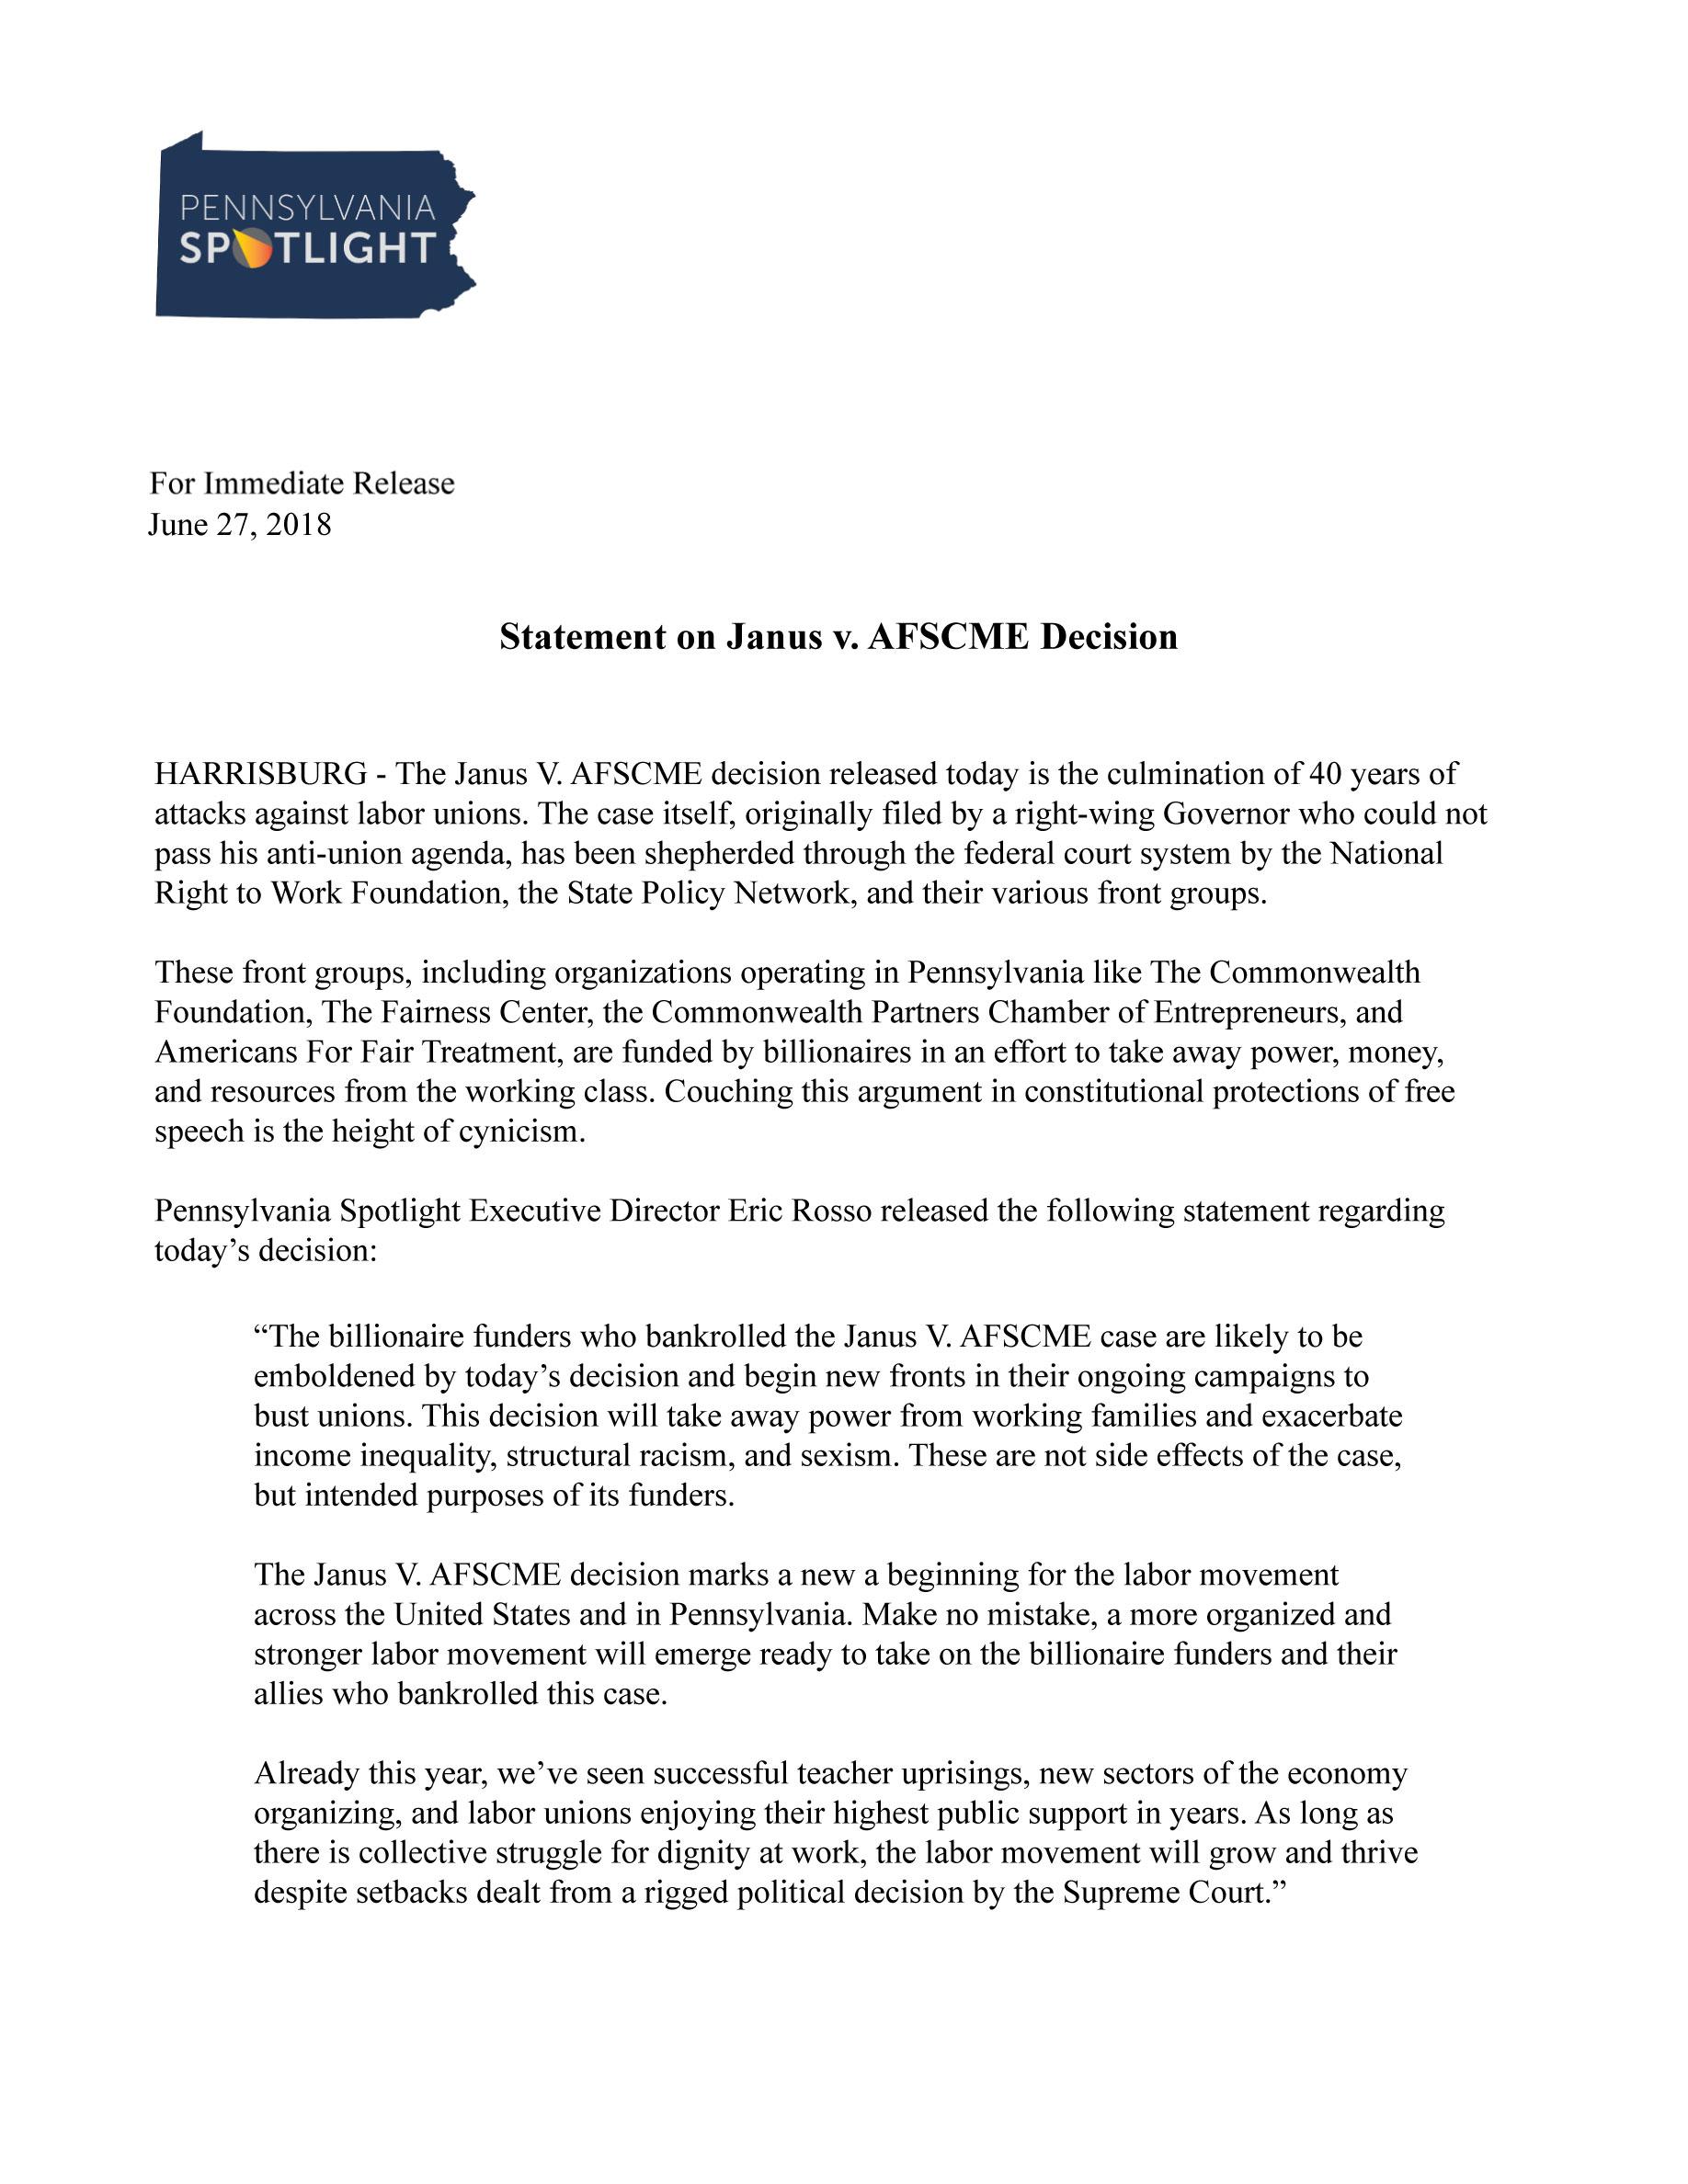 Statement on Janus v  AFSCME Decision | Pennsylvania Spotlight